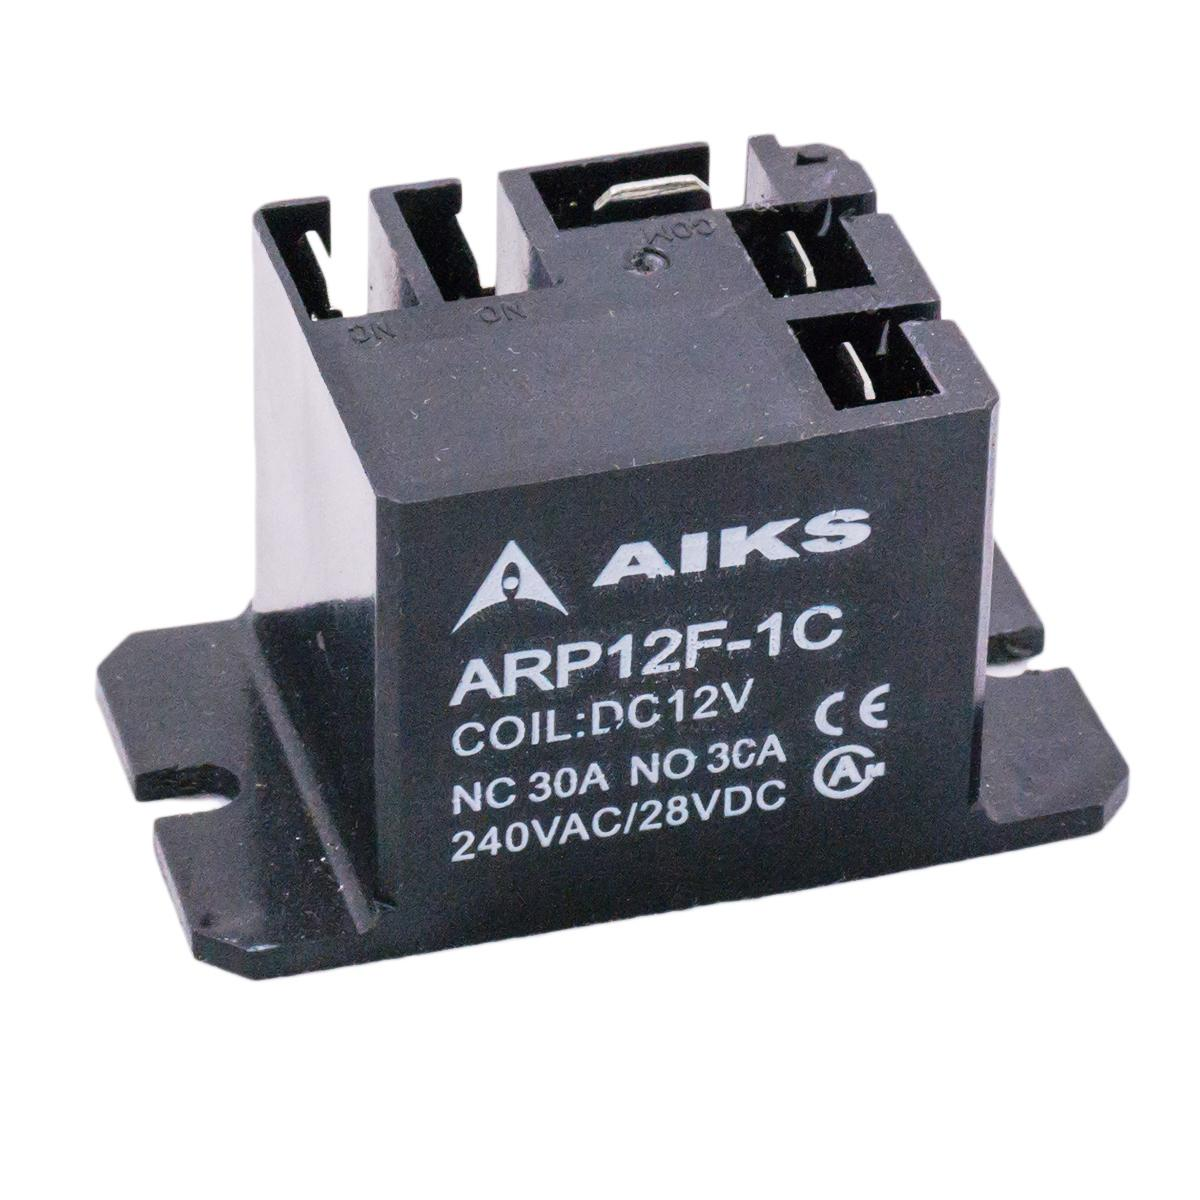 Relé AIKS ARP12F-1C - 30A - Coil: DC12V | 240VAC/28VDC